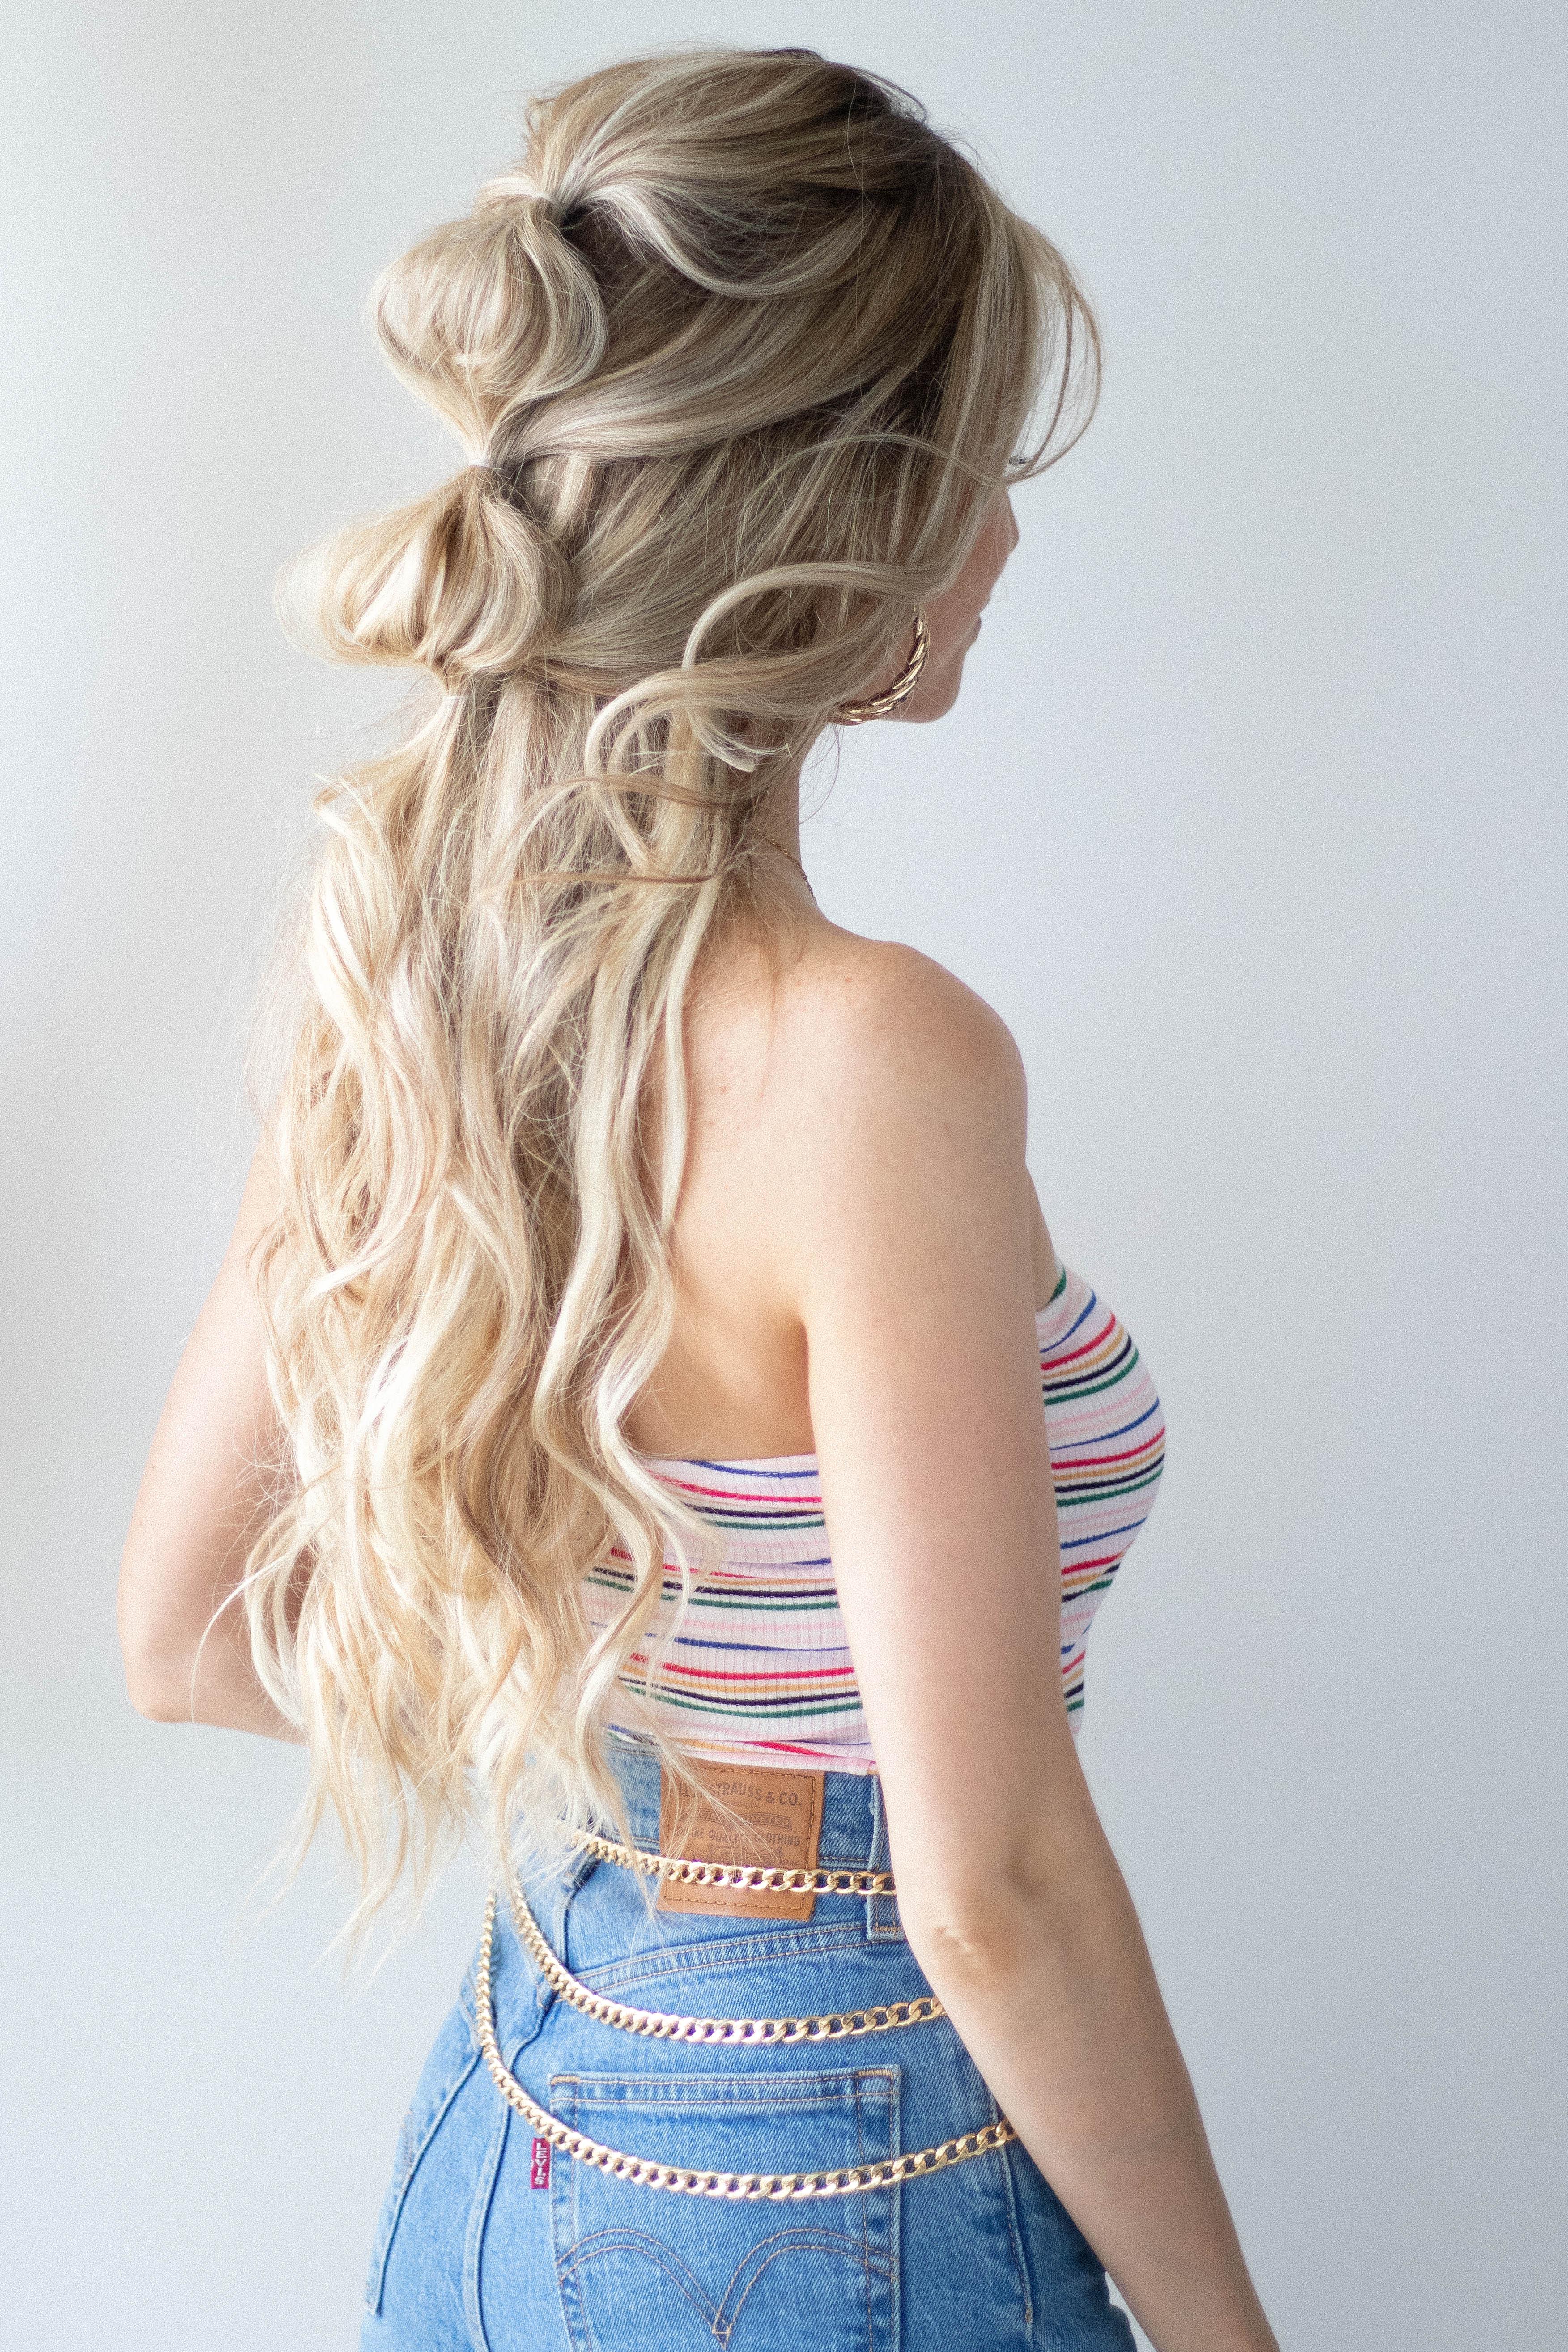 CUTE & EASY BUBBLE BRAID HAIR TUTORIAL | www.alexgaboury.com